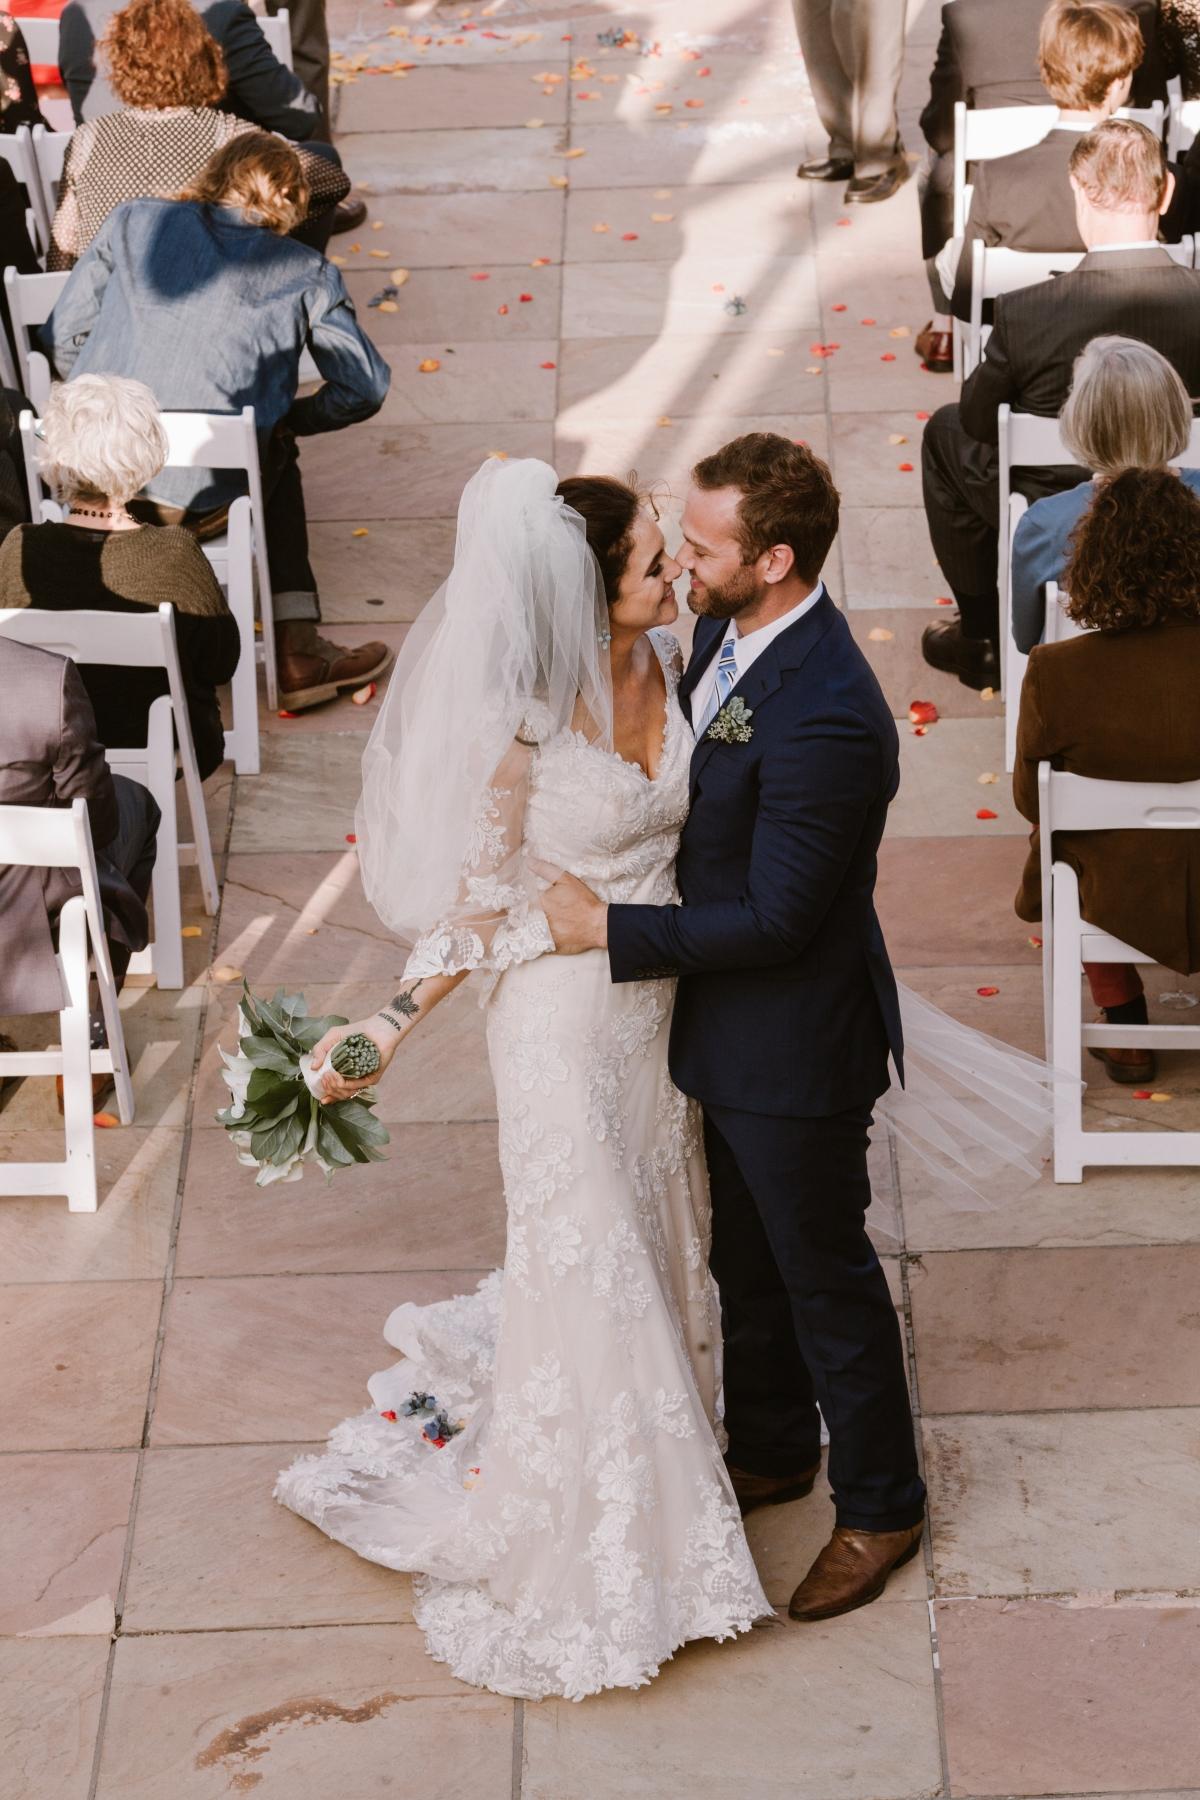 Wedding Venue Hot Spots in New Mexico {PartThree!}